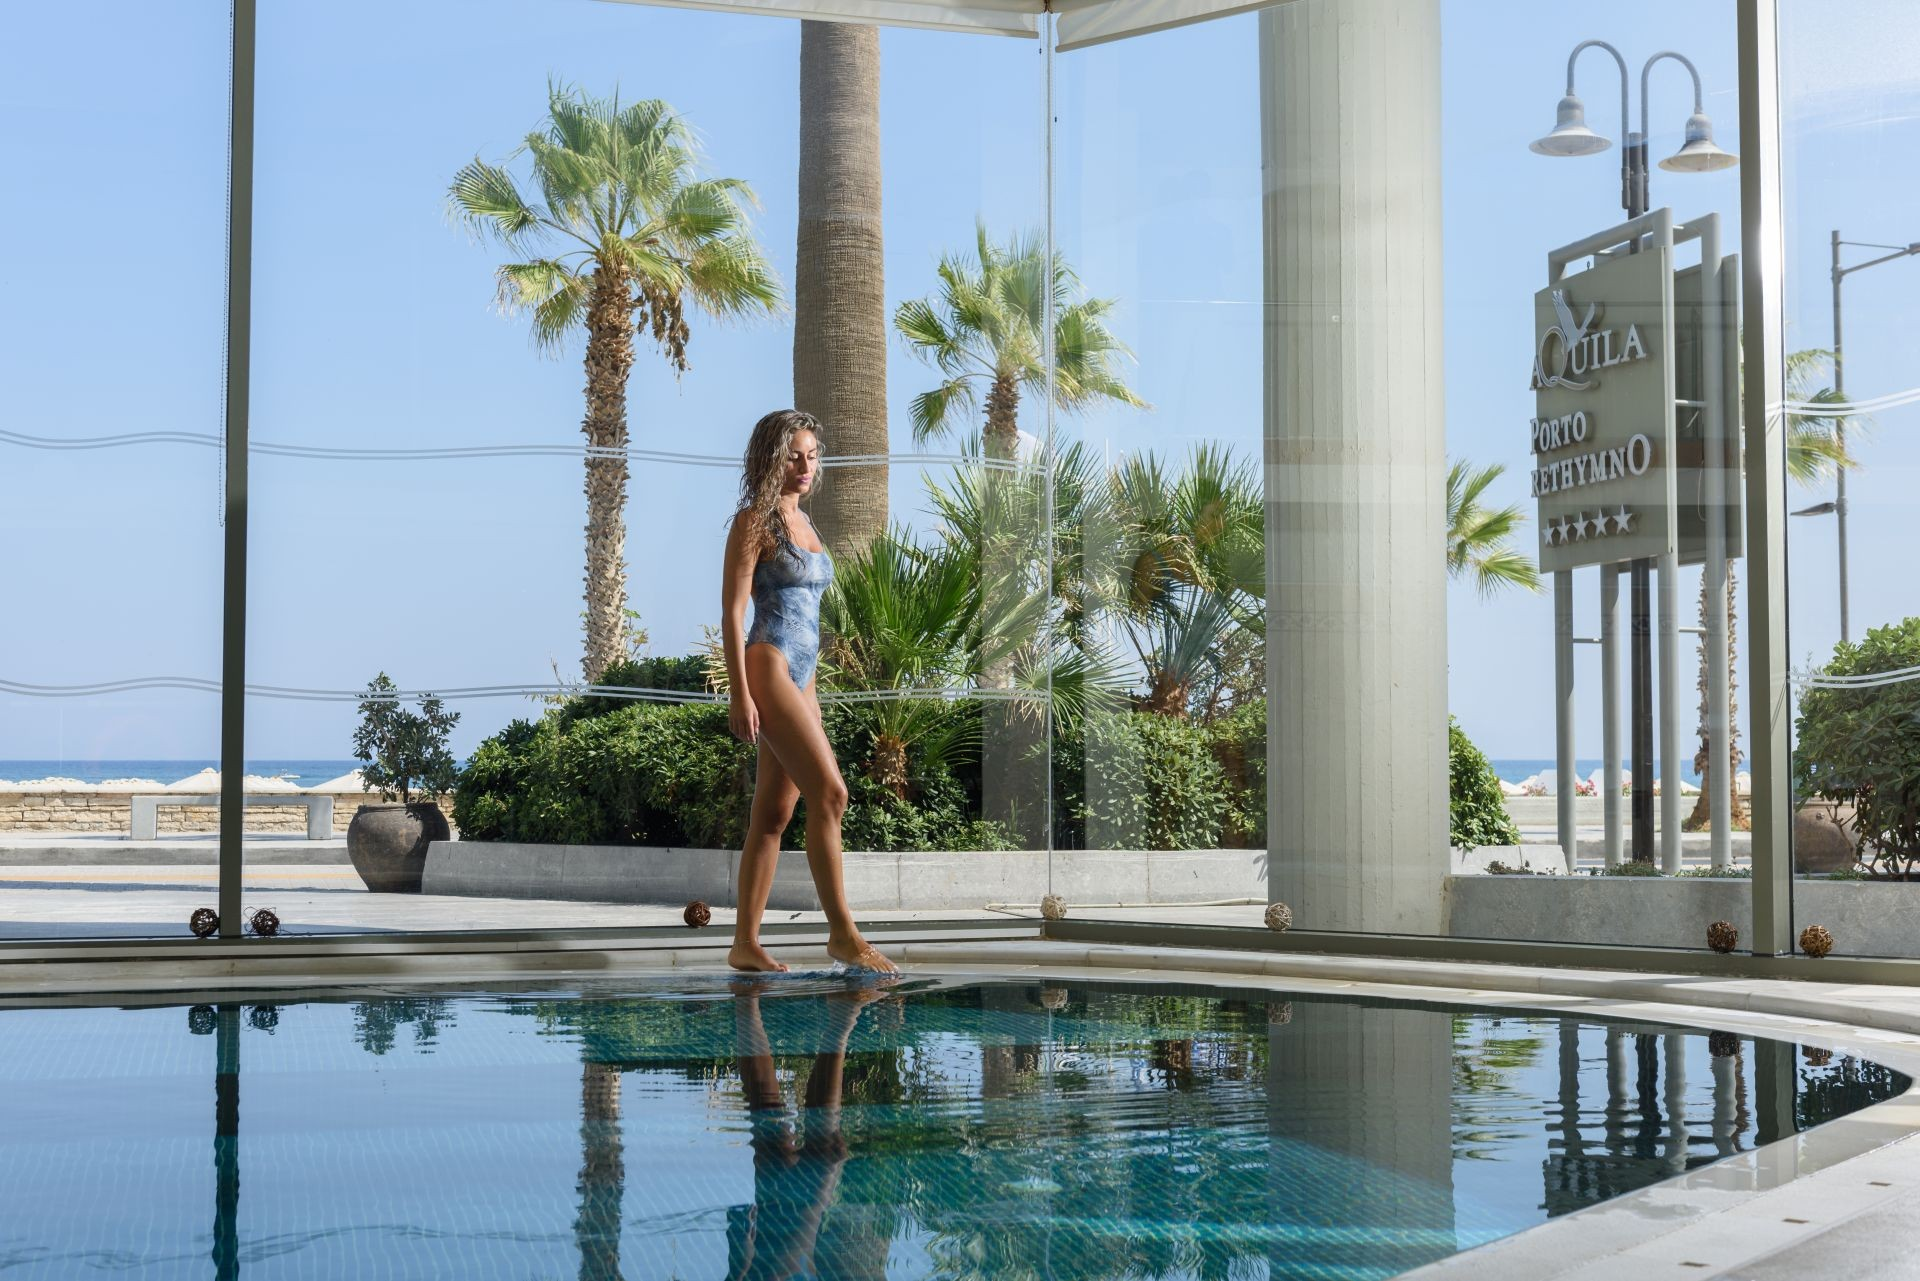 Aquila Porto Rethymno Hotel Indoor Pool 1 Hotels In Crete Aquila Hotels Resorts